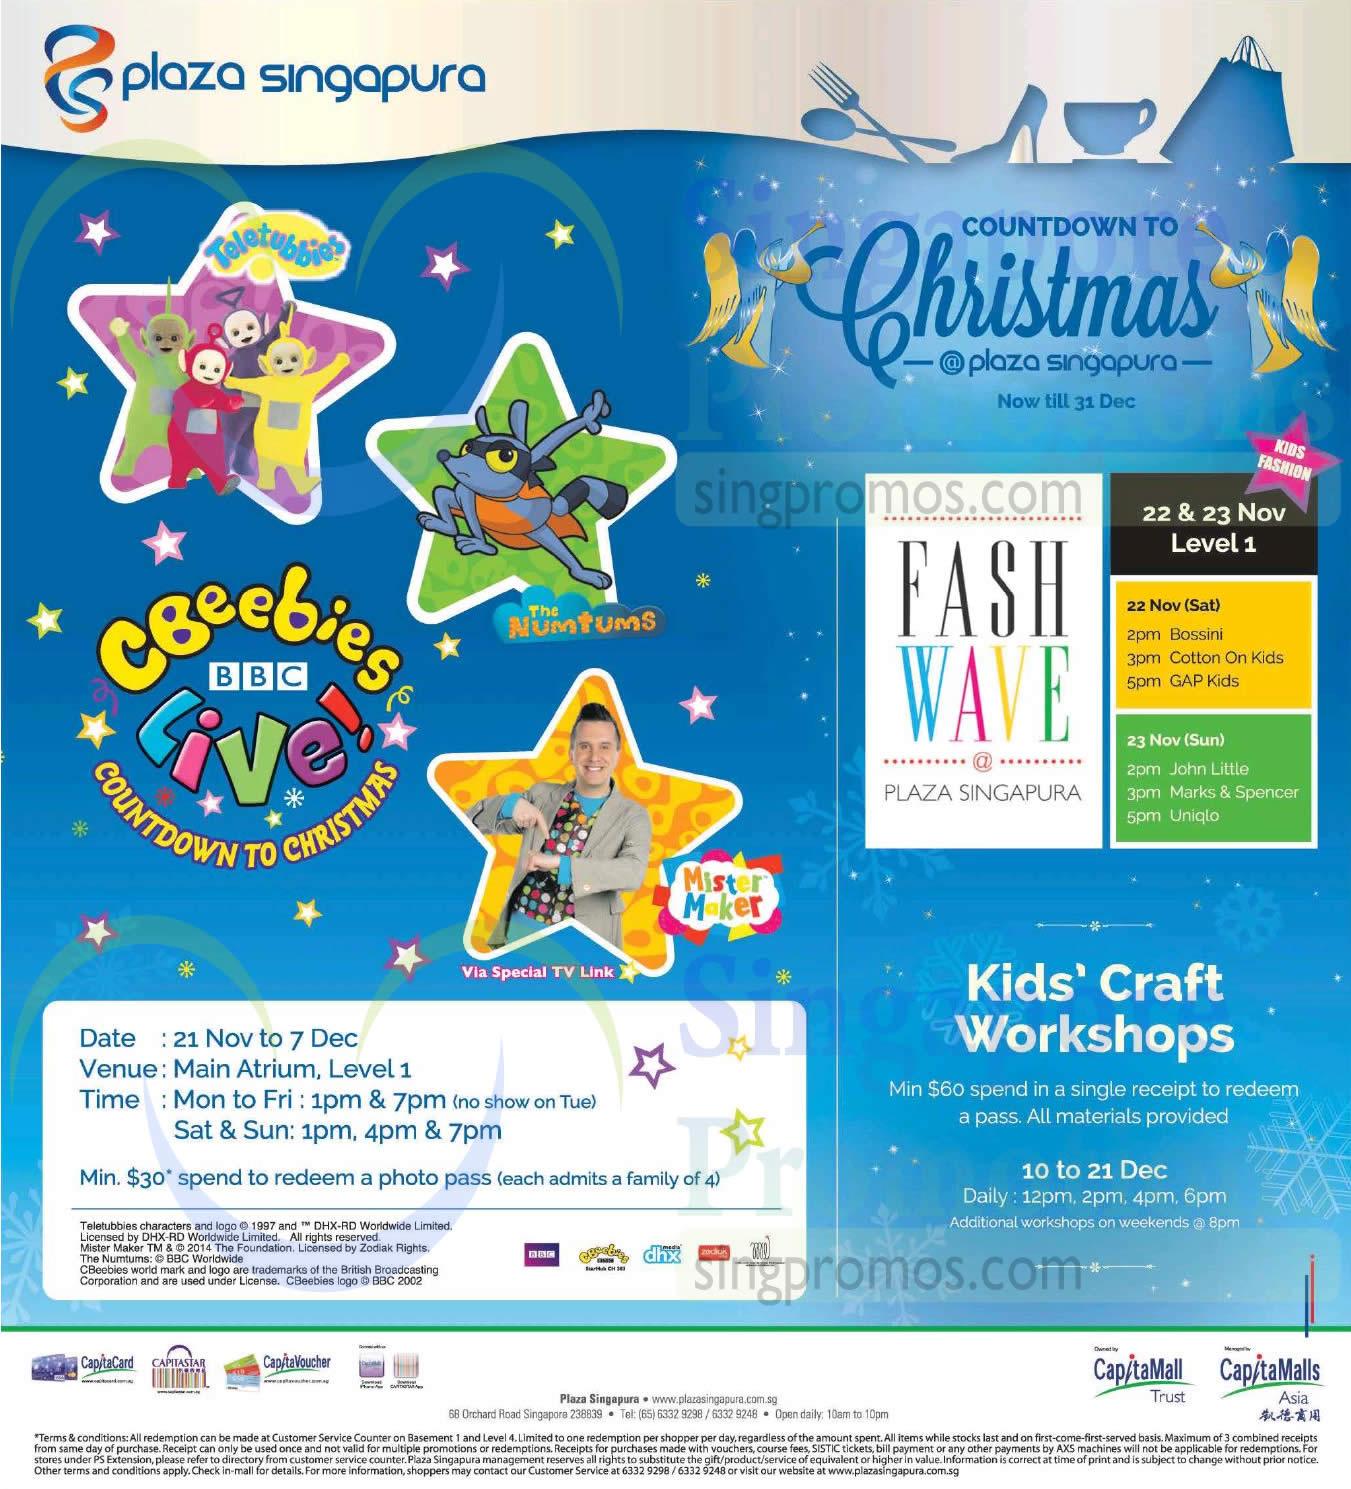 Plaza Singapura Christmas Promotions amp Activities 21 Nov